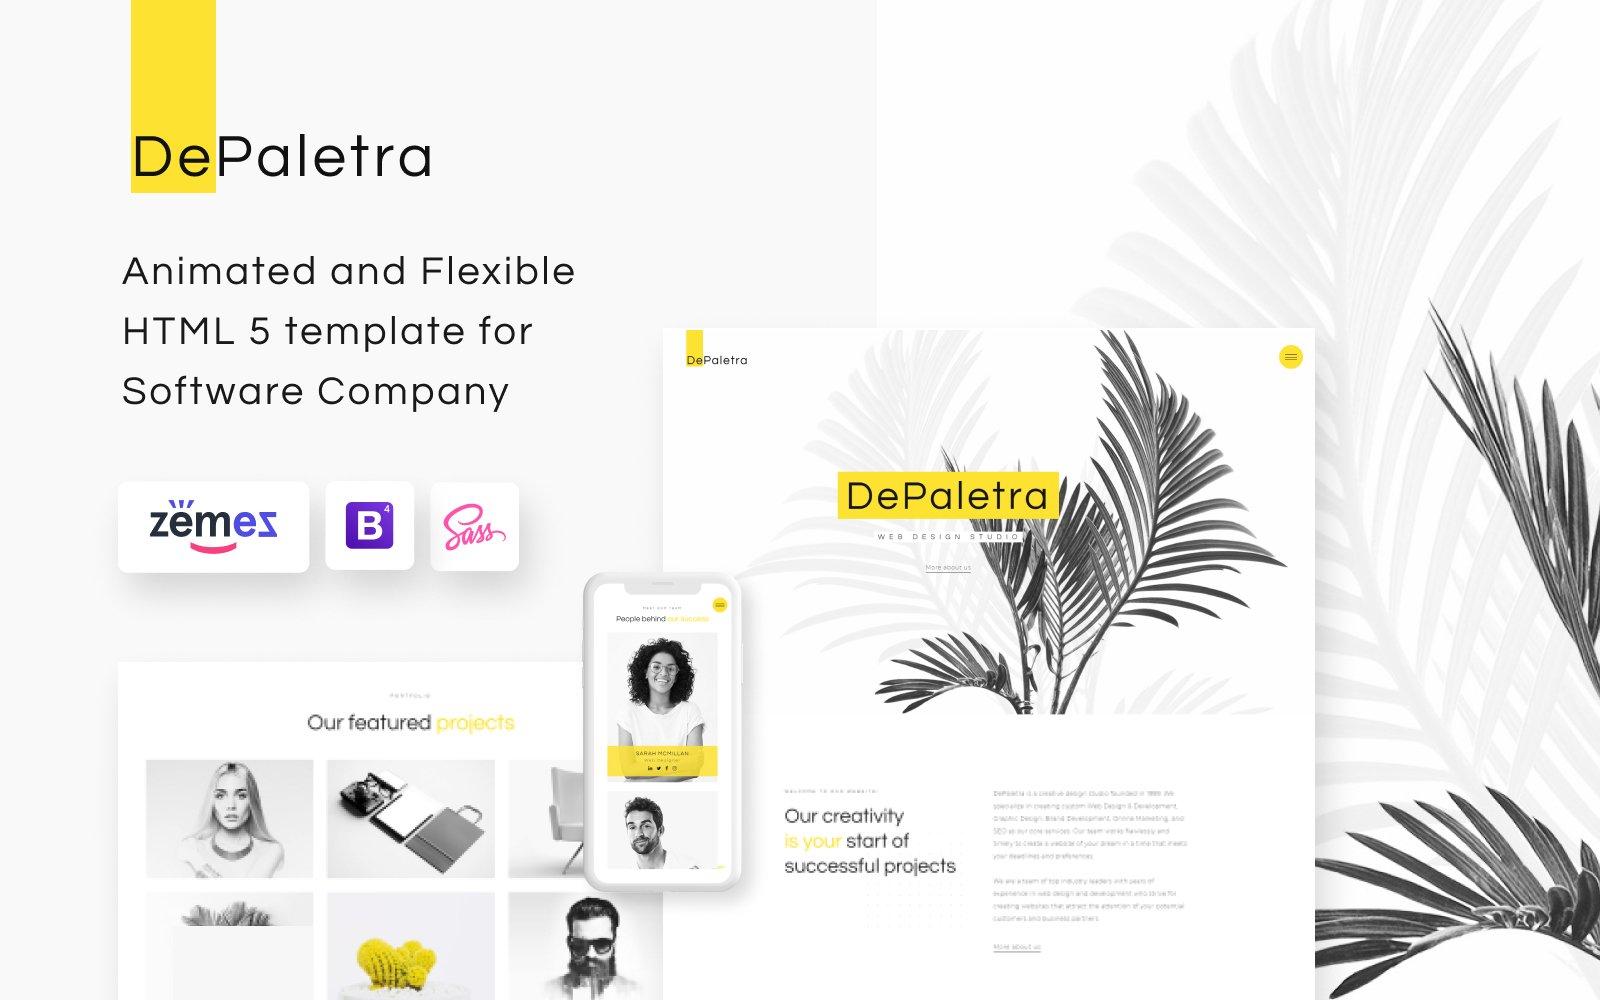 Reszponzív DePaletra - Web Design Studio Weboldal sablon 74167